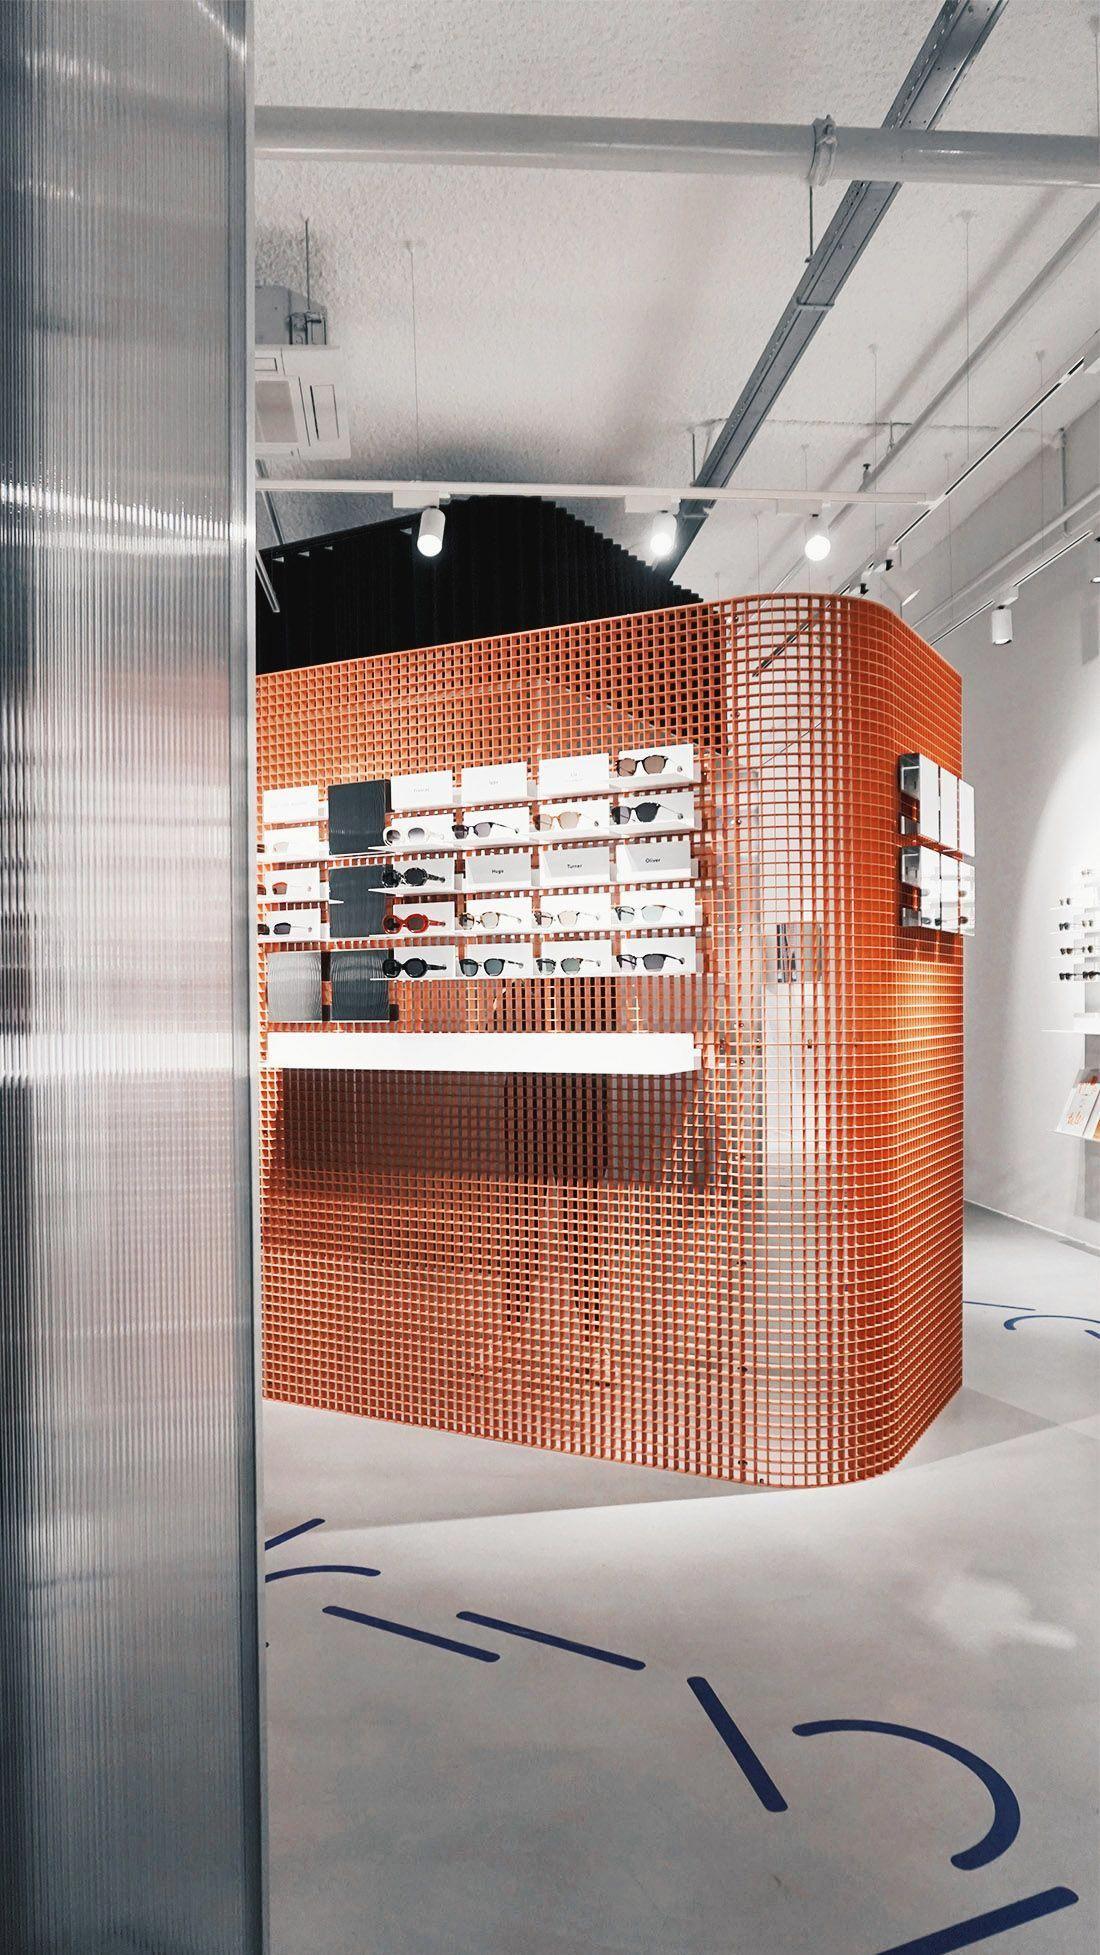 De Mooiste Brillenzaak Ace Tate Eindhoven The Interior Gatherer Commercialinteriors Commercial Design Design Store Design